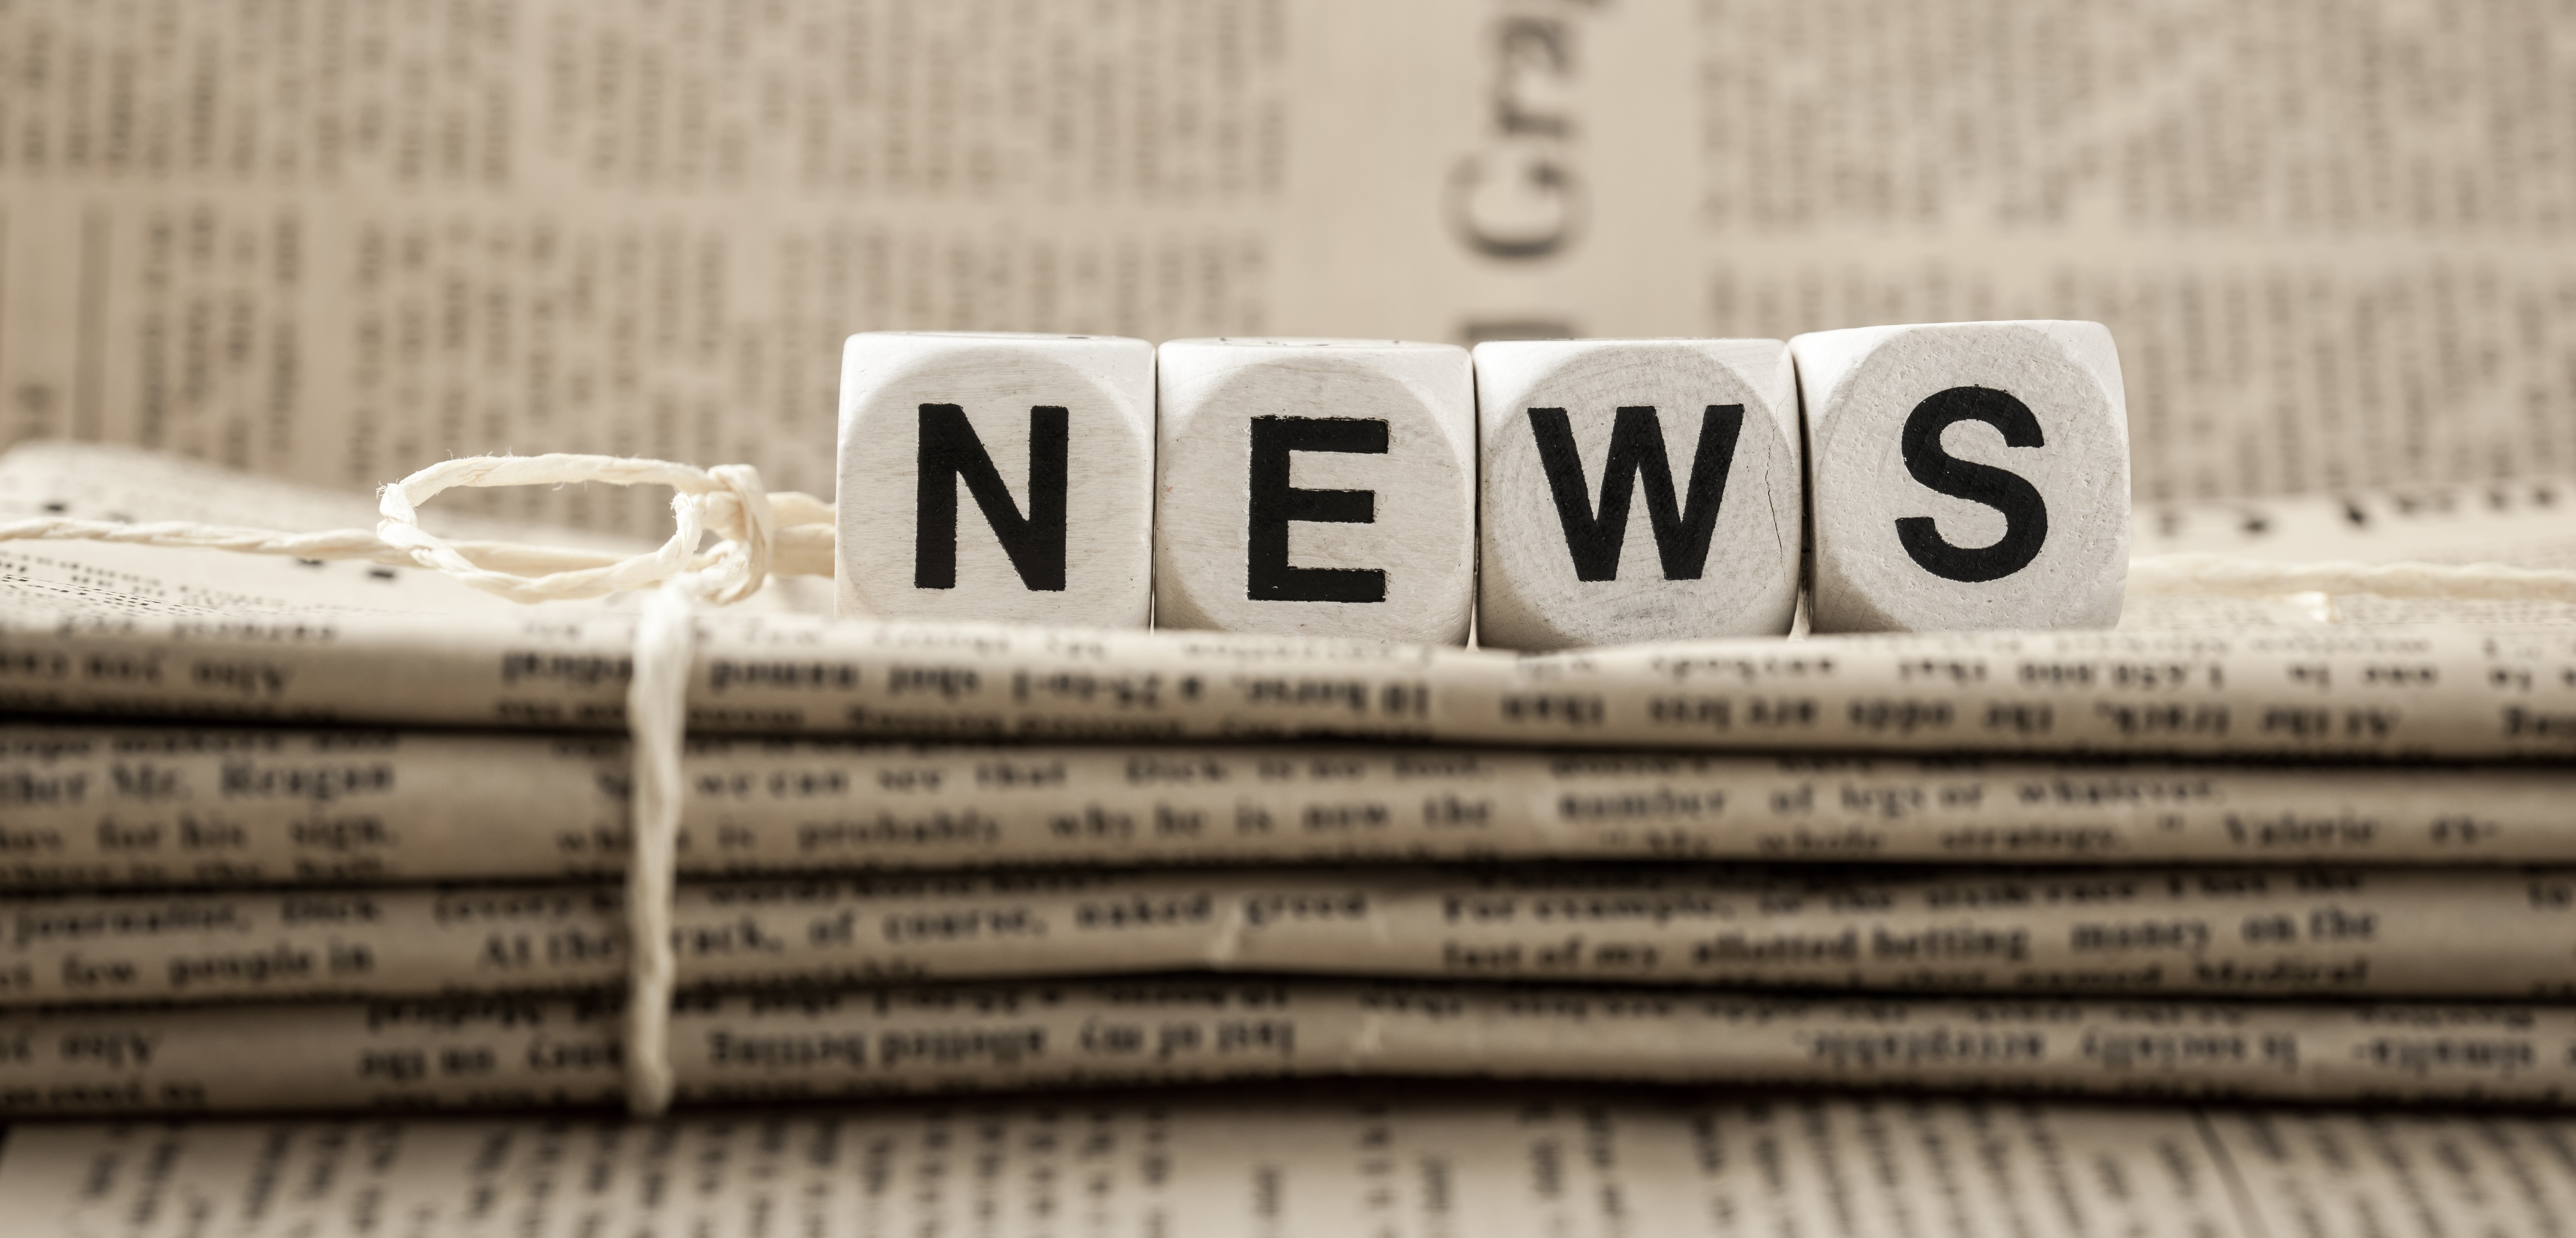 Newsletter Insertion For Authors